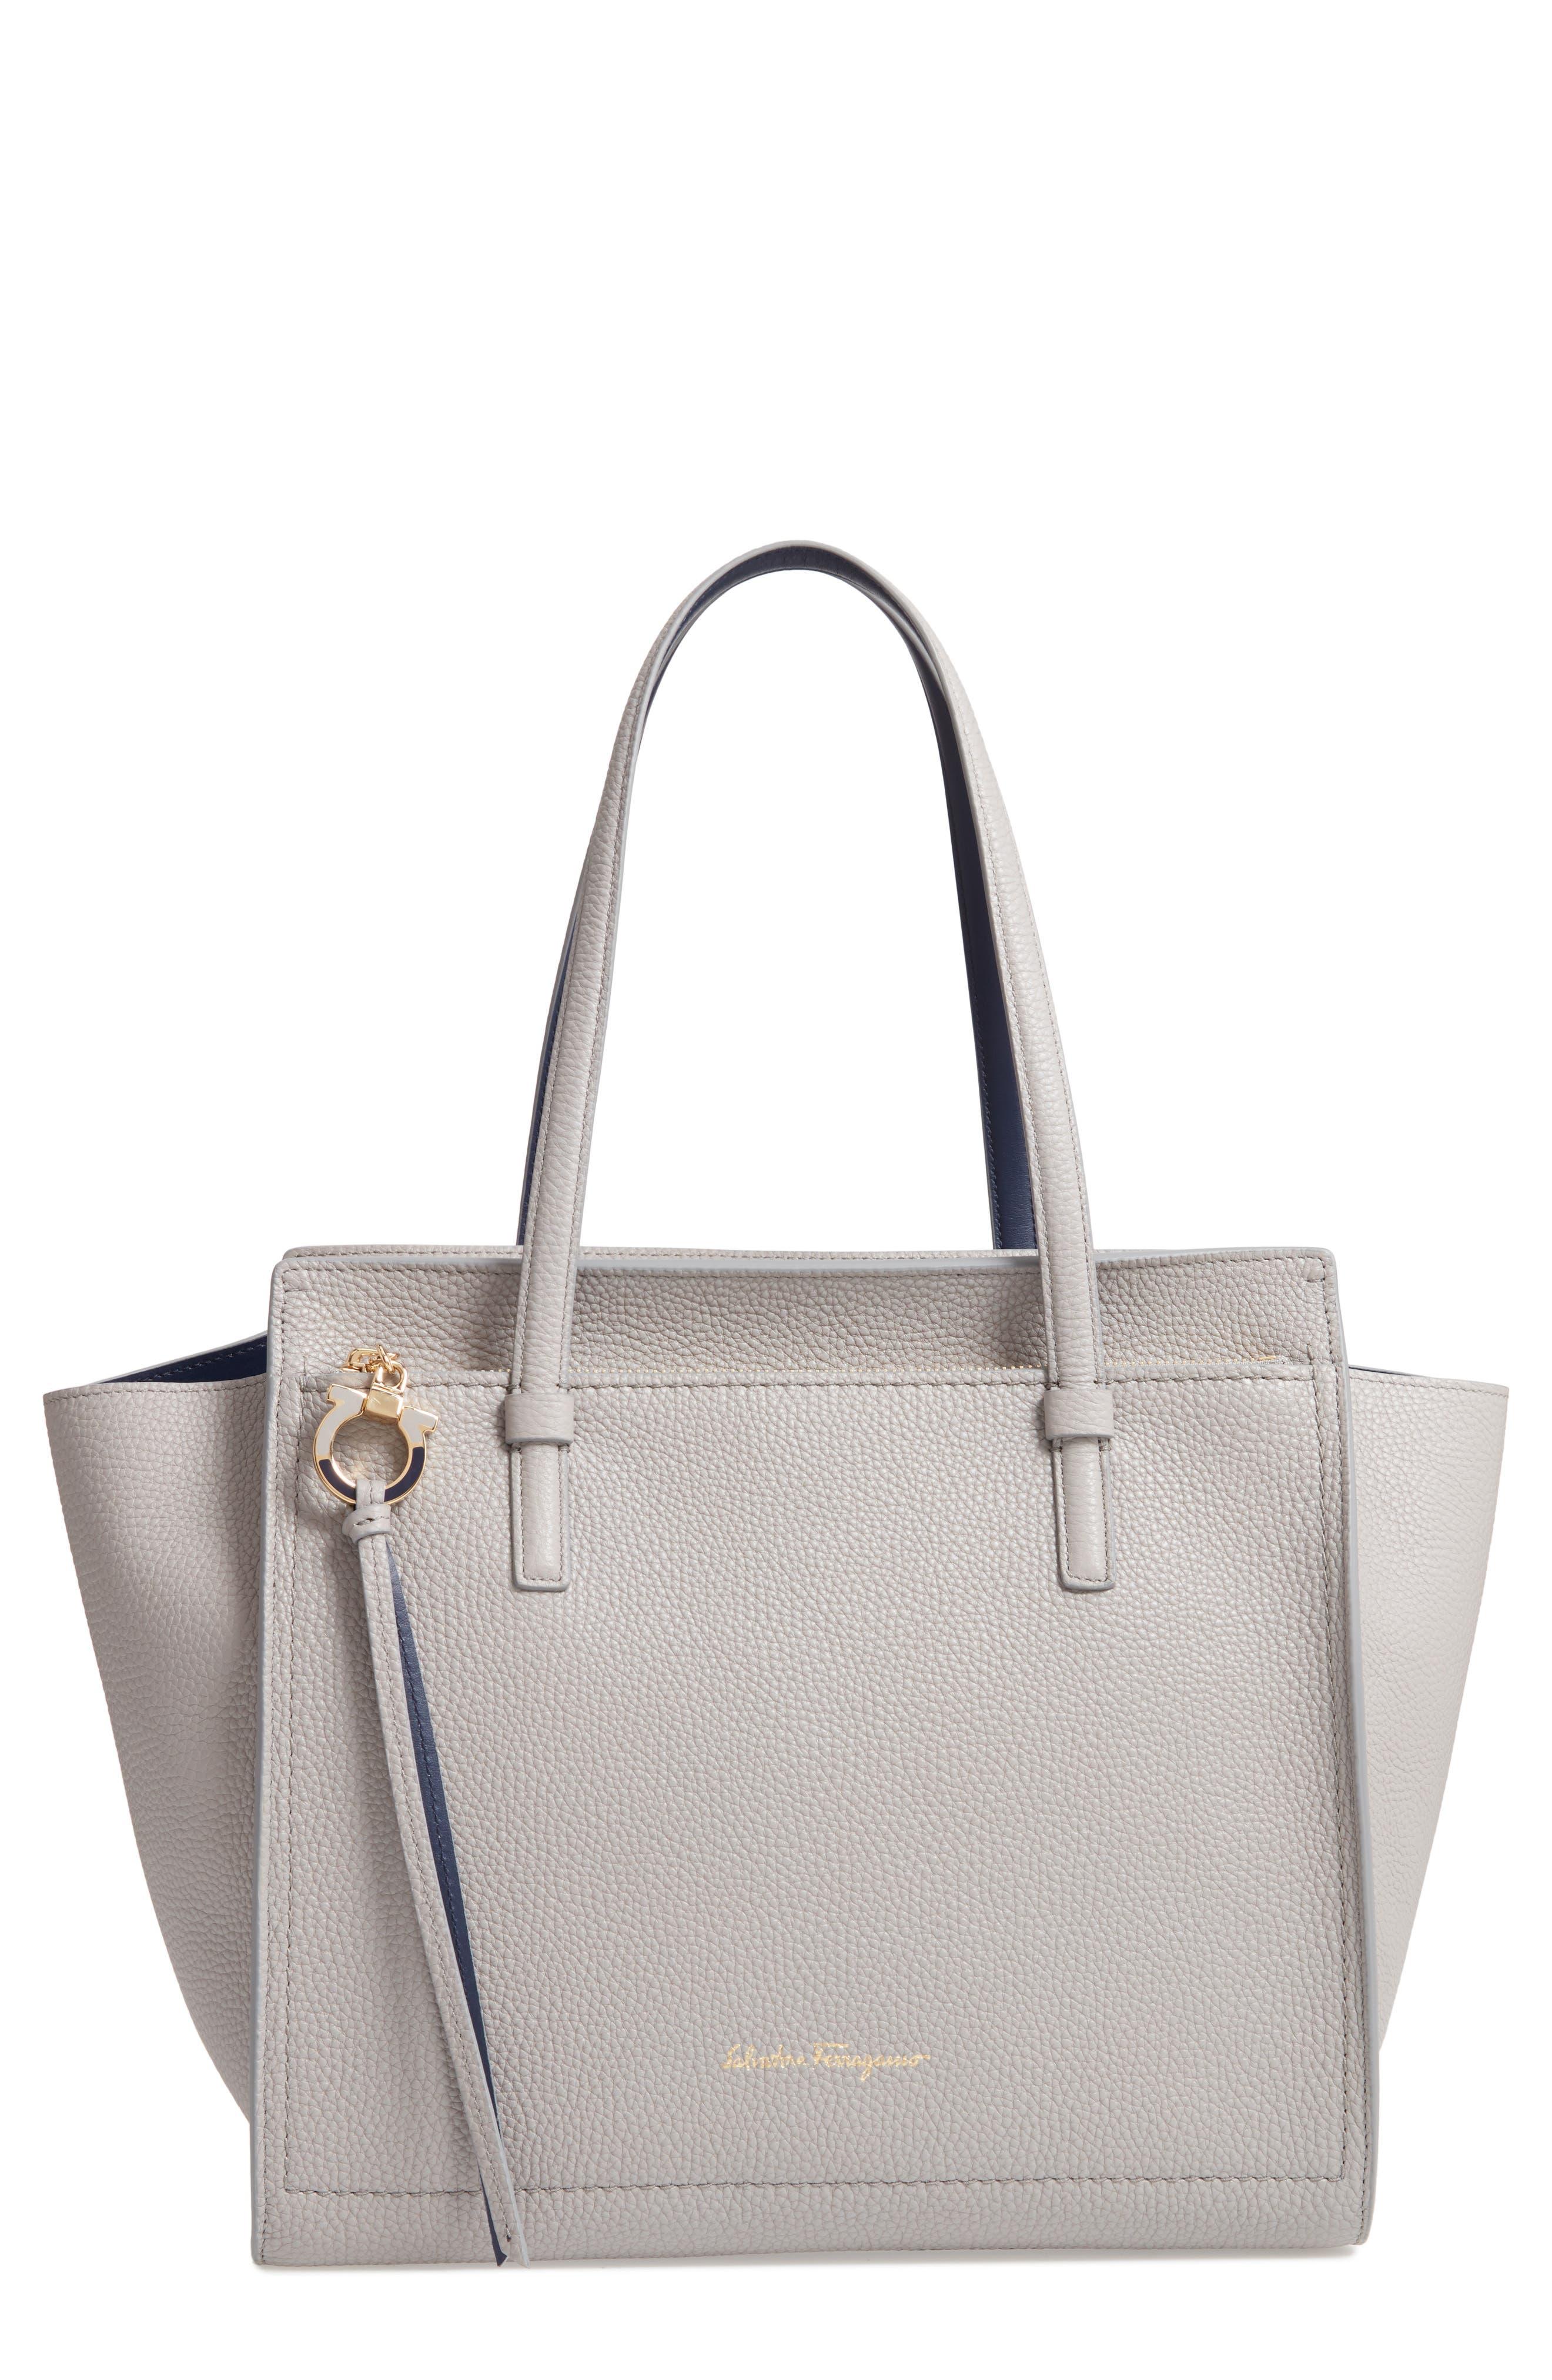 74fed480fd9 Designer Tote Bags for Women   Nordstrom